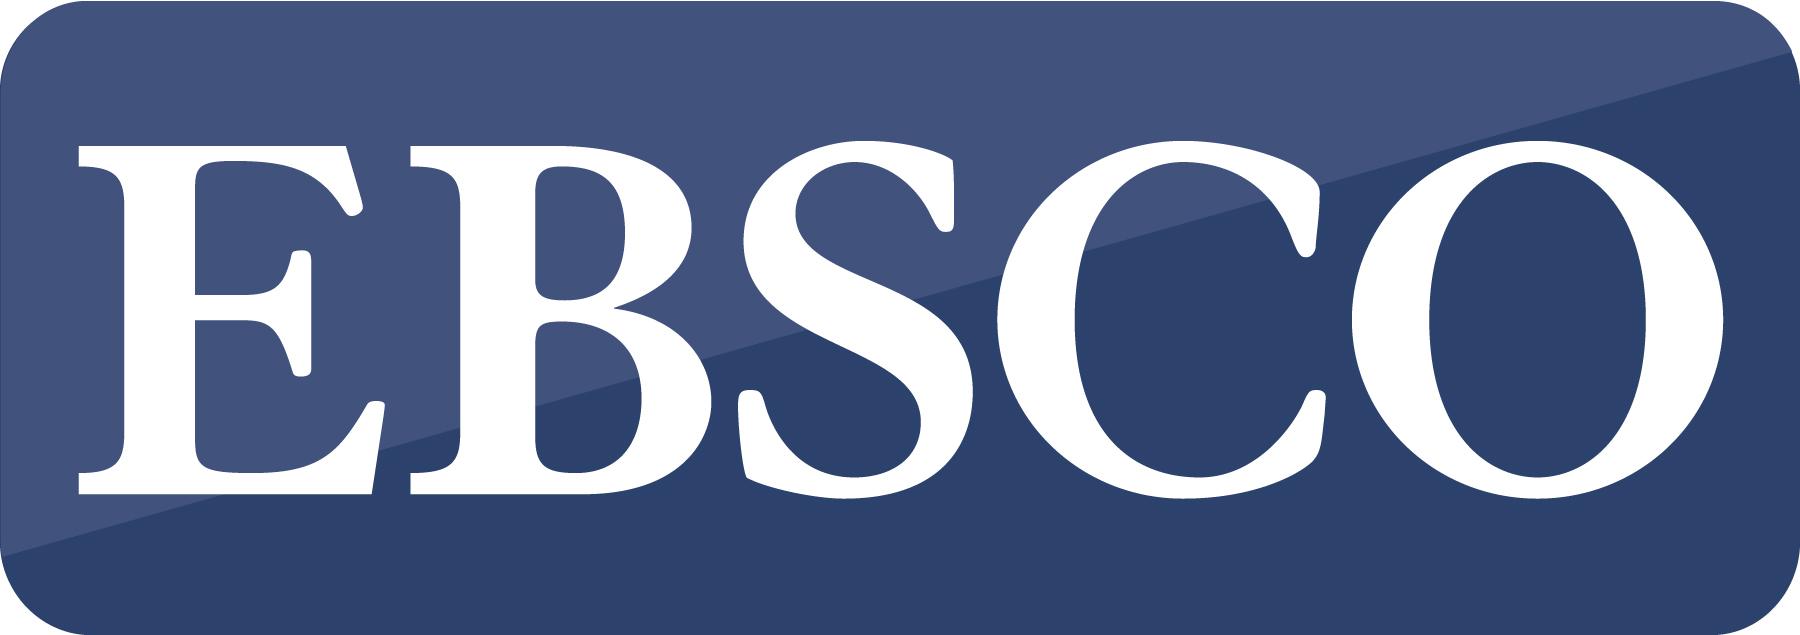 Ebsco logo